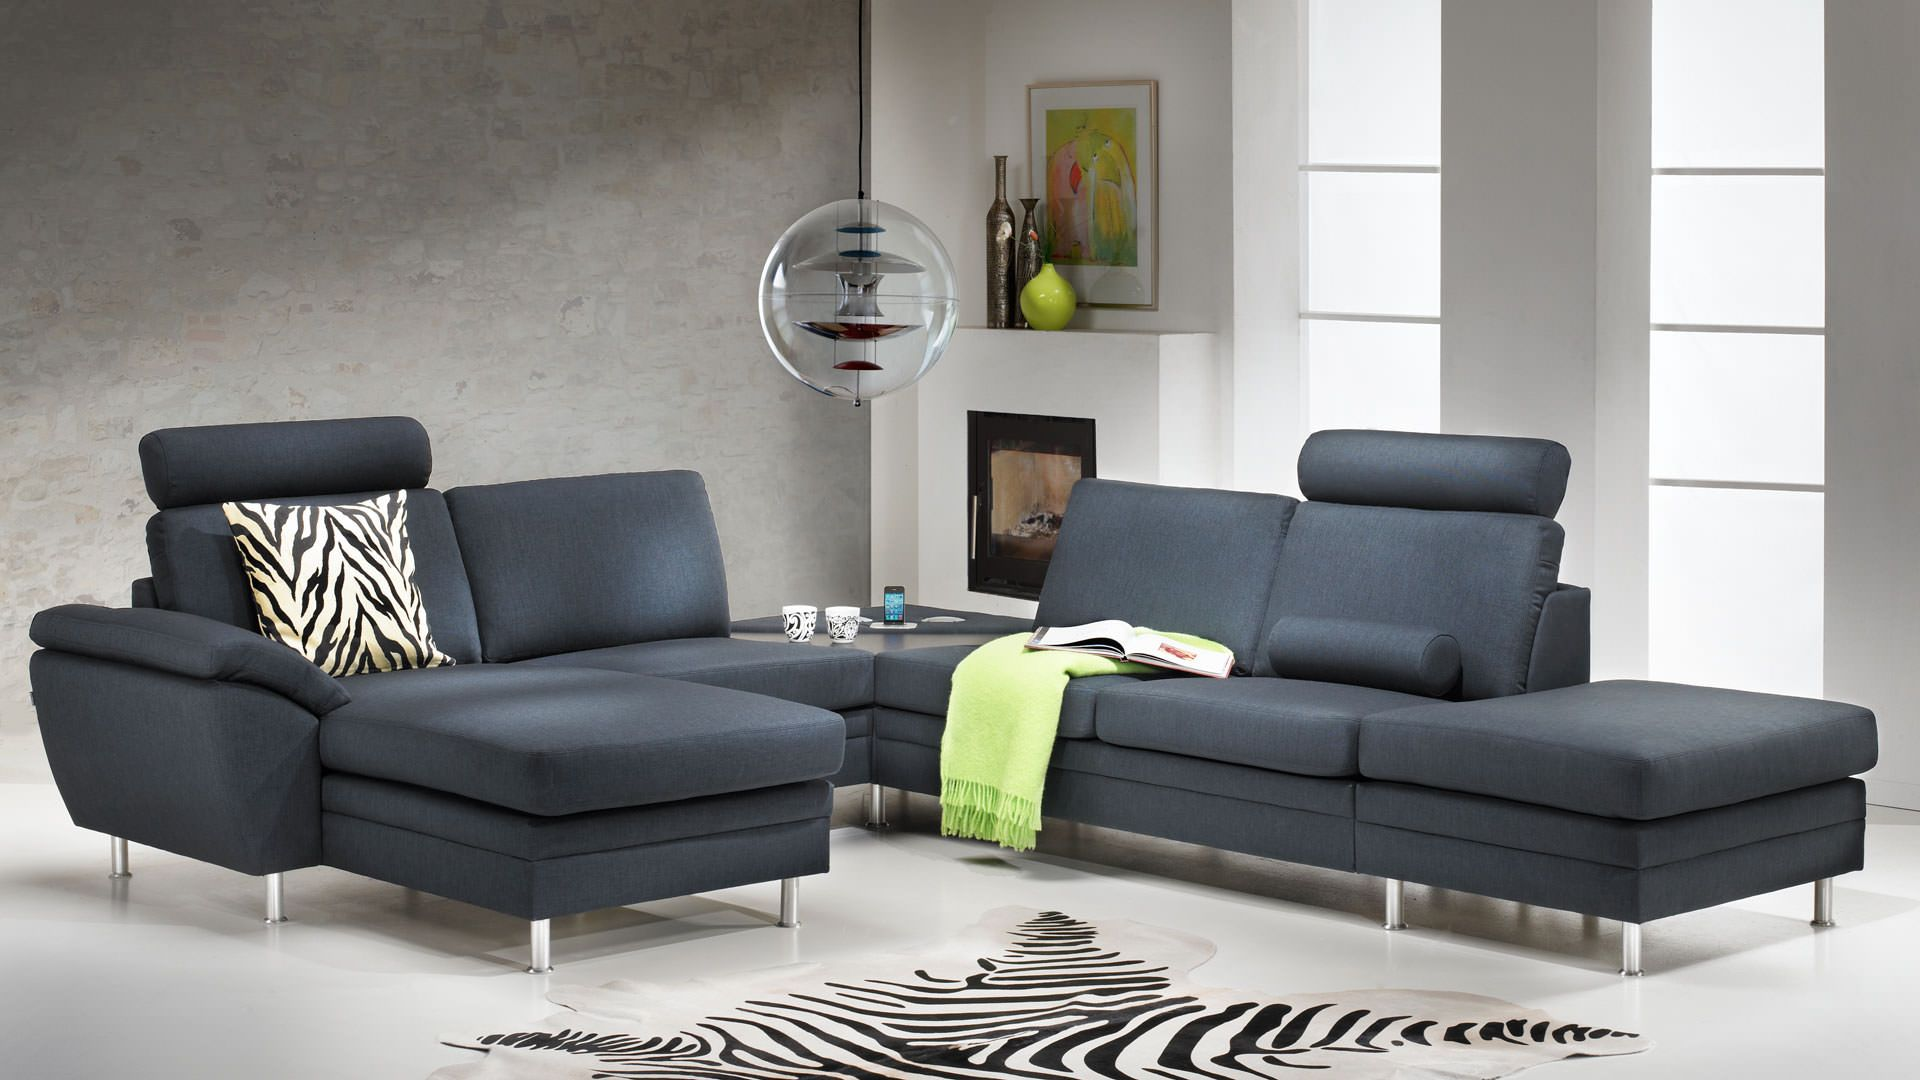 Multibygg couch corner sofa green danish design hjort ...